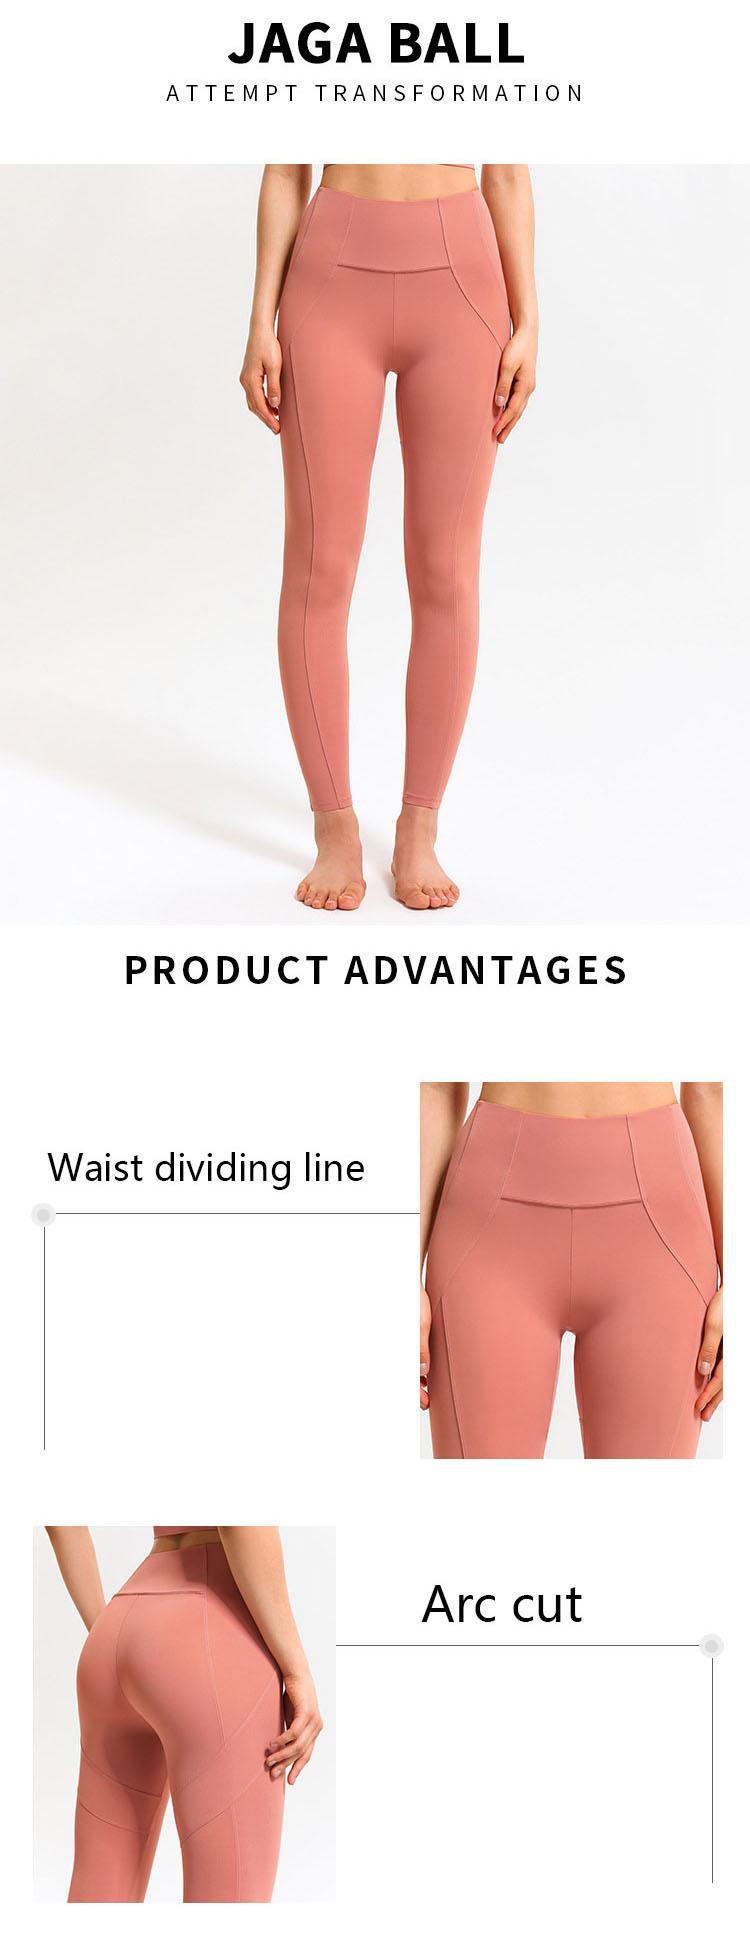 The side seam design of the leggings training